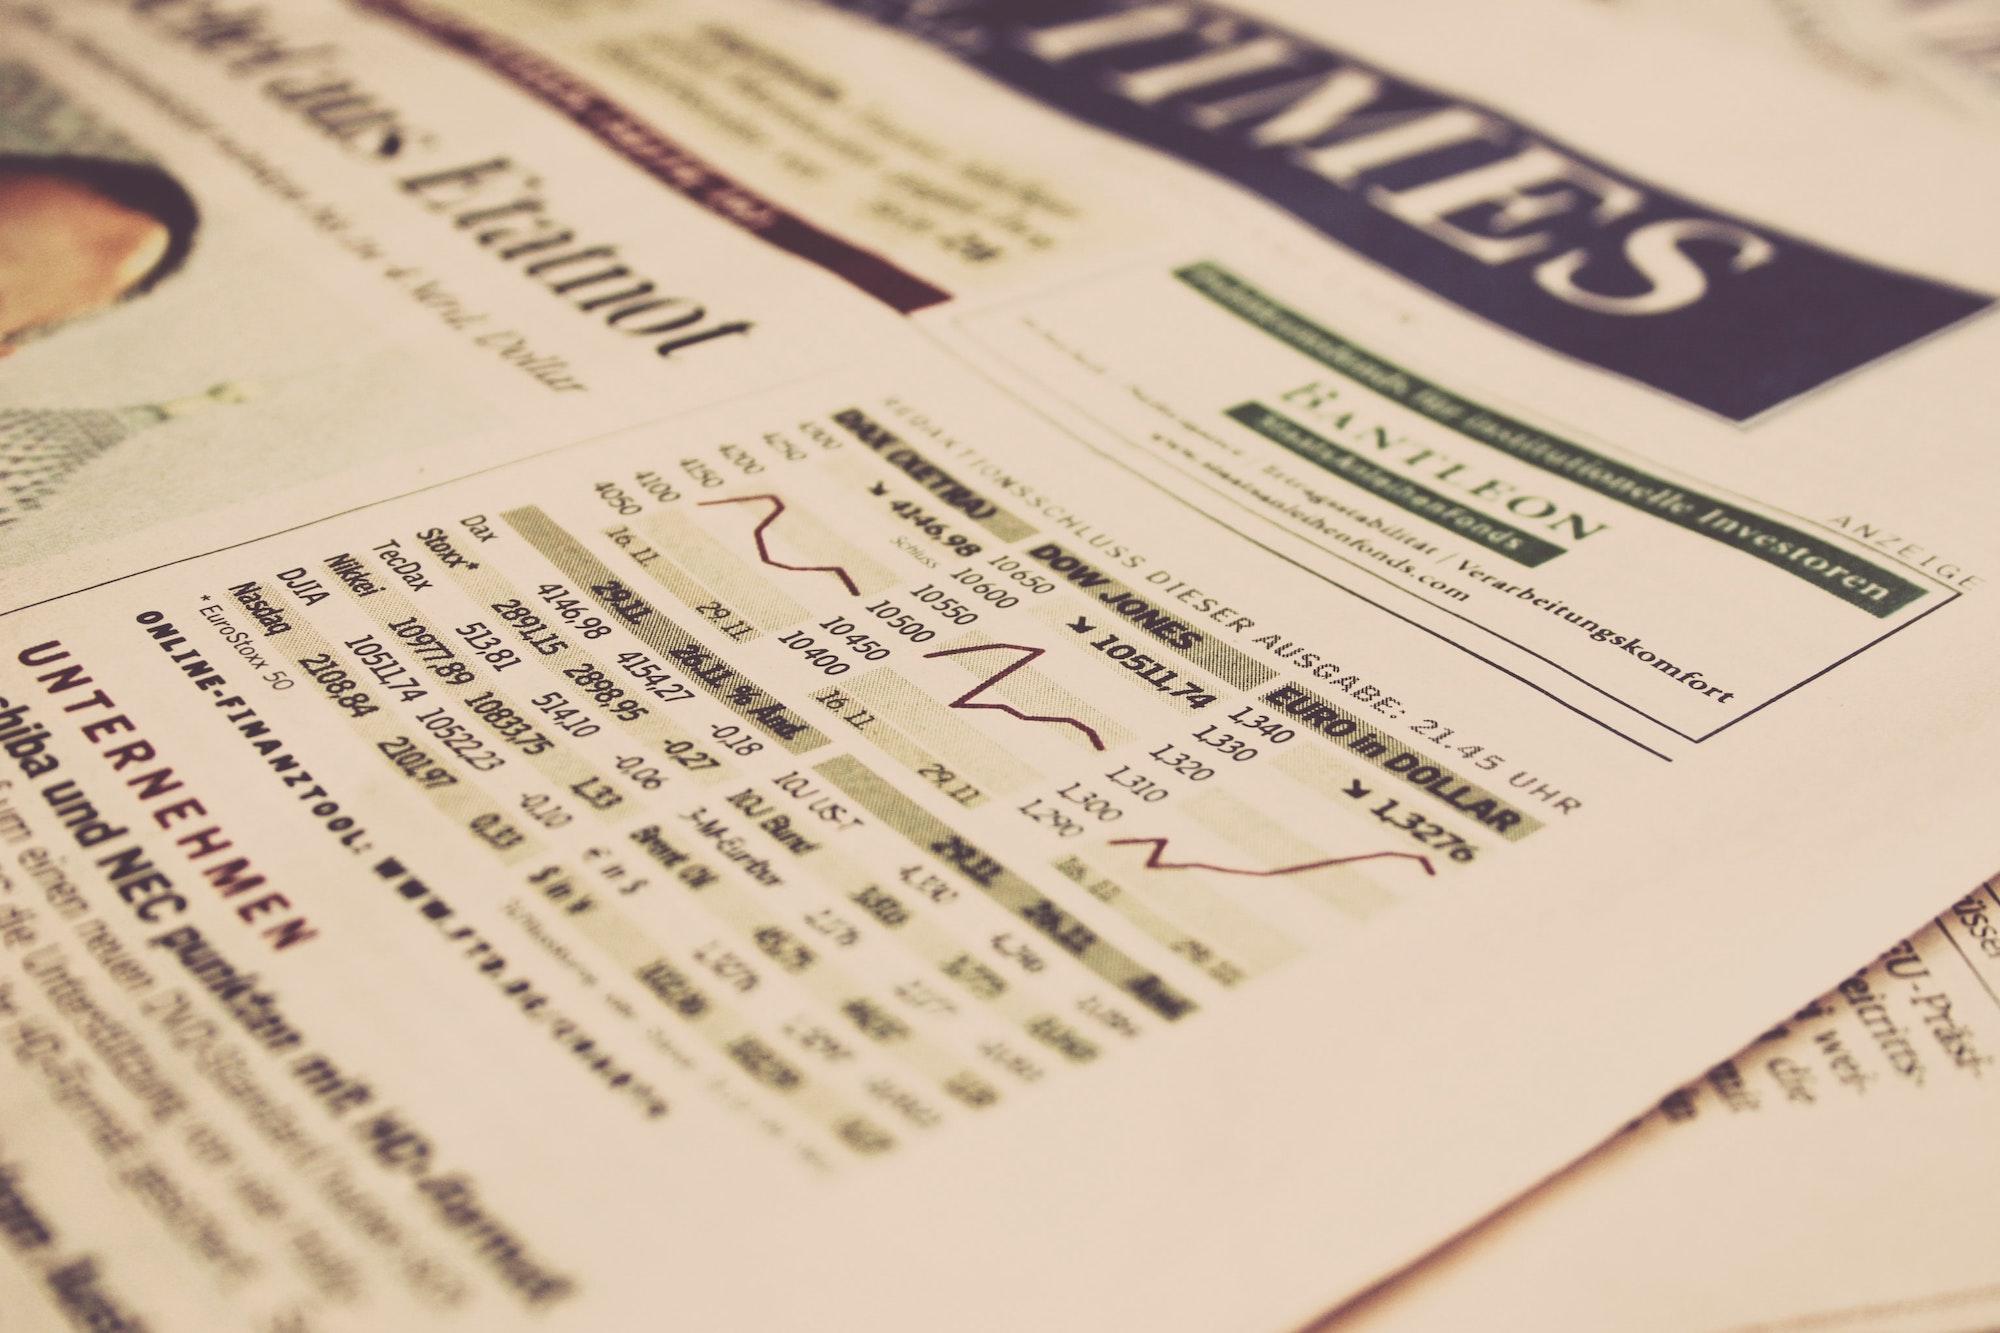 Stock advice